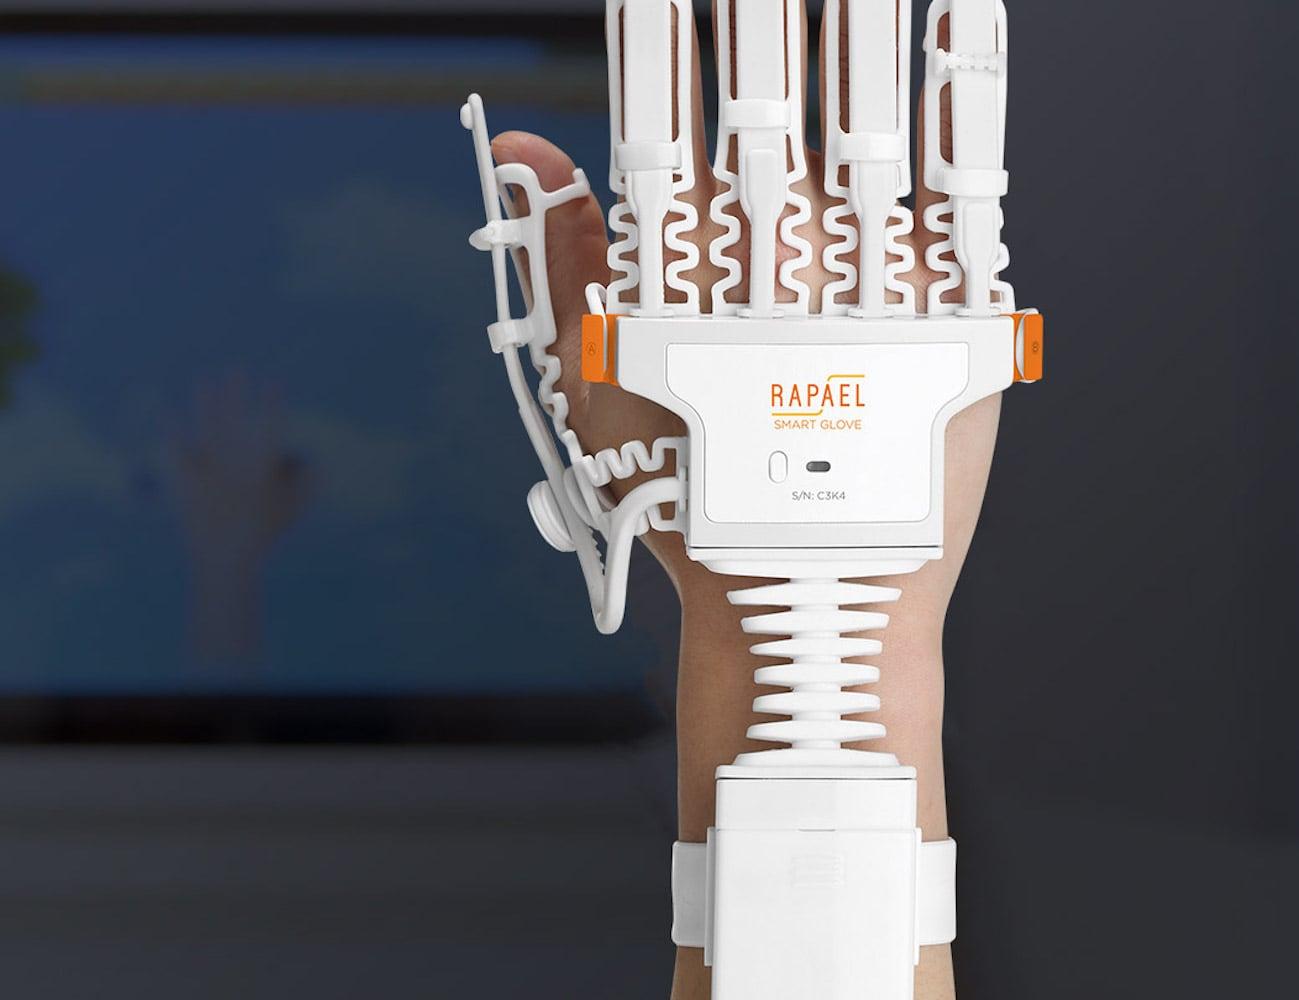 Rapael Smart Hand Rehabilitation Glove was designed for stroke survivors